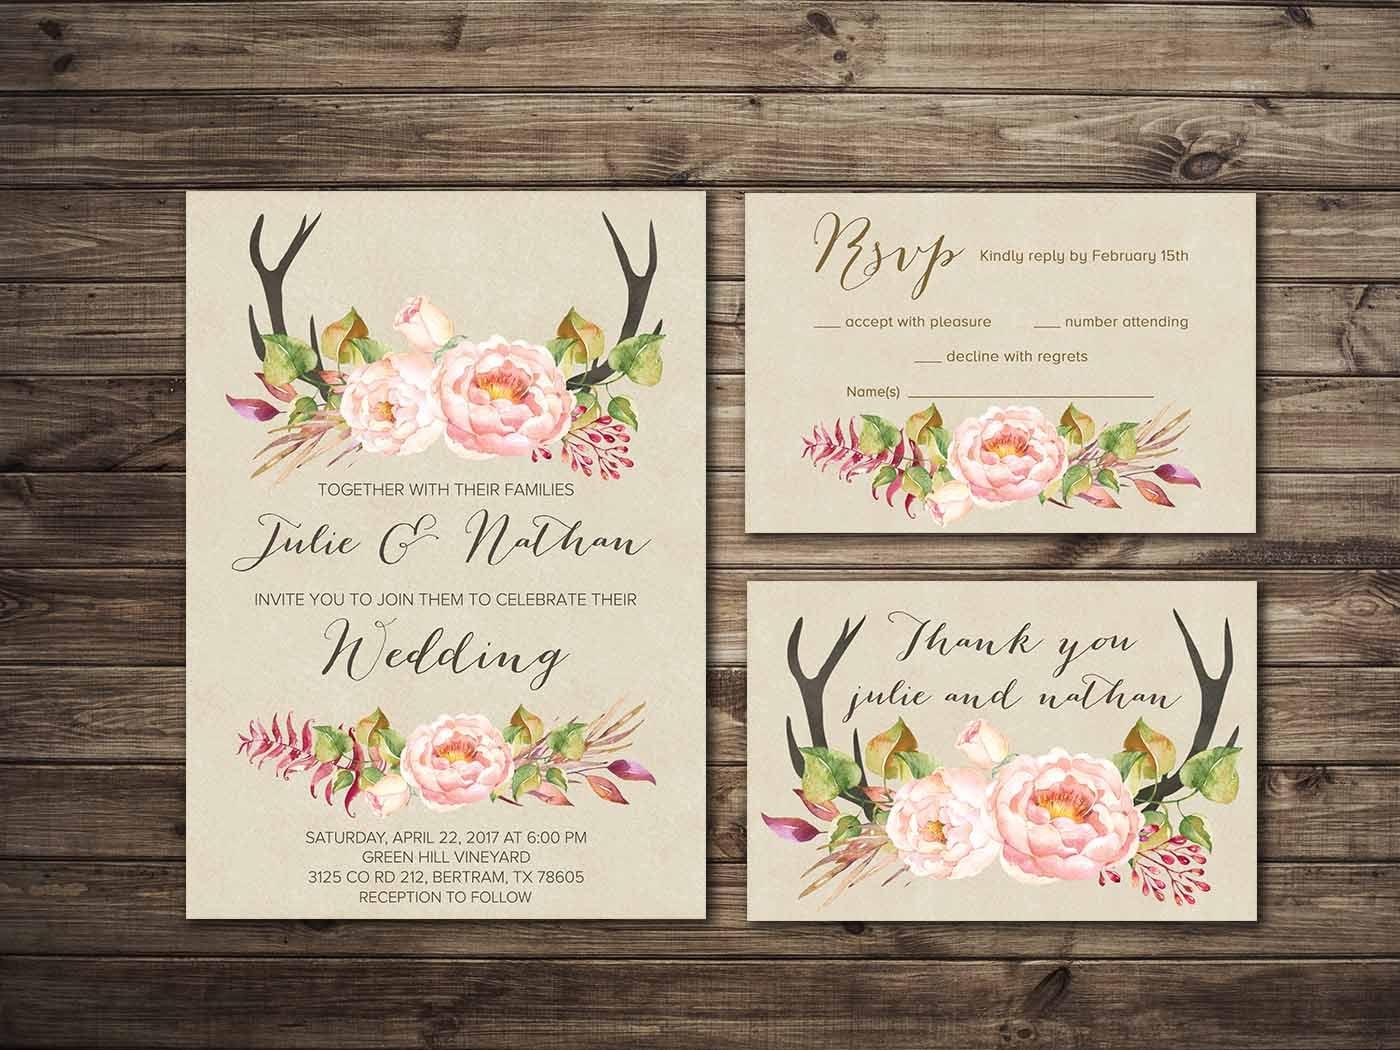 Print Out Wedding Invitations: Boho Wedding Invitation Printable Floral Wedding Invitation